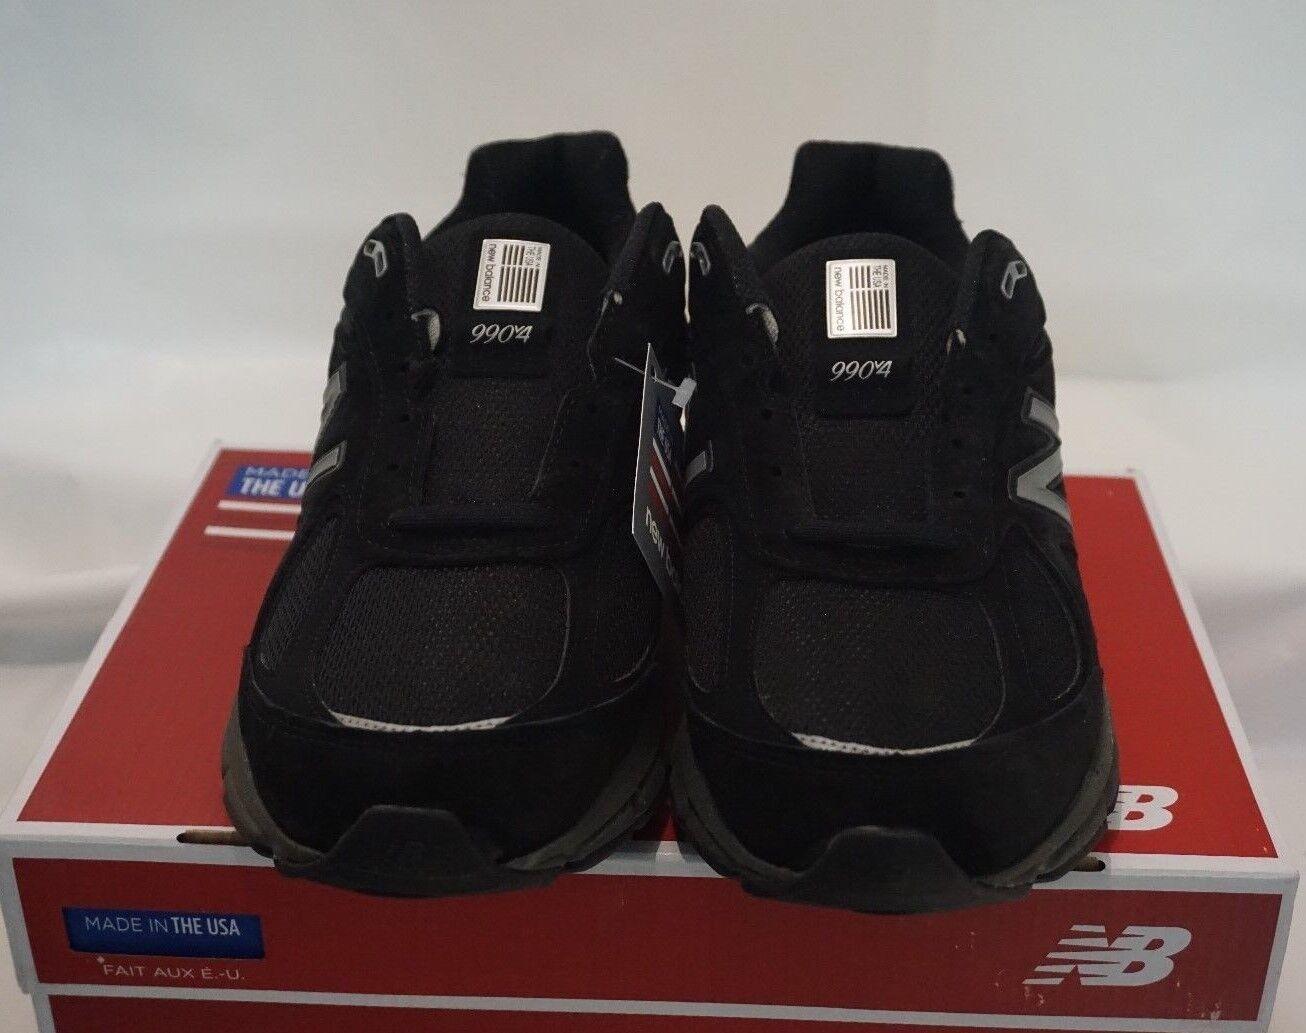 Uomo NEW BALANCE 990v4 990v4 990v4 Running scarpe - Dimensione 11 US ( 2E ) eaaf99